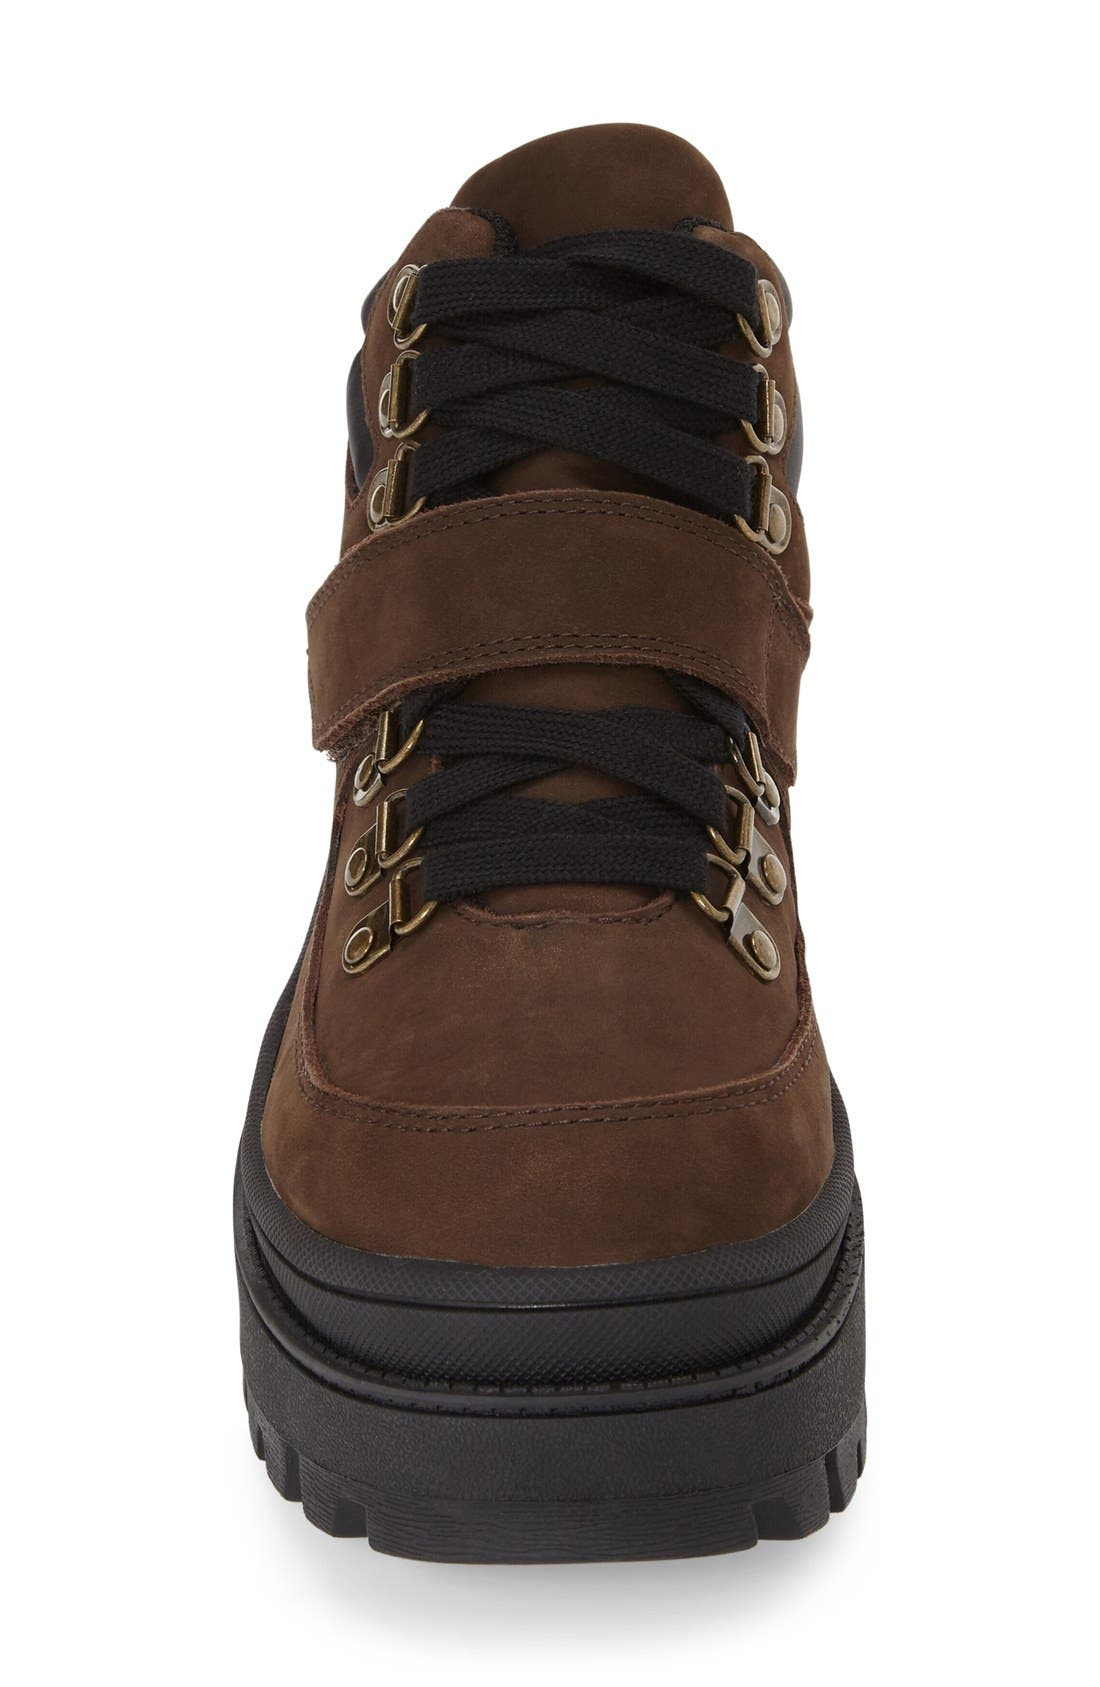 Alternate Image 3  - Jeffrey Campbell 'Top-Peak' Boot (Women)